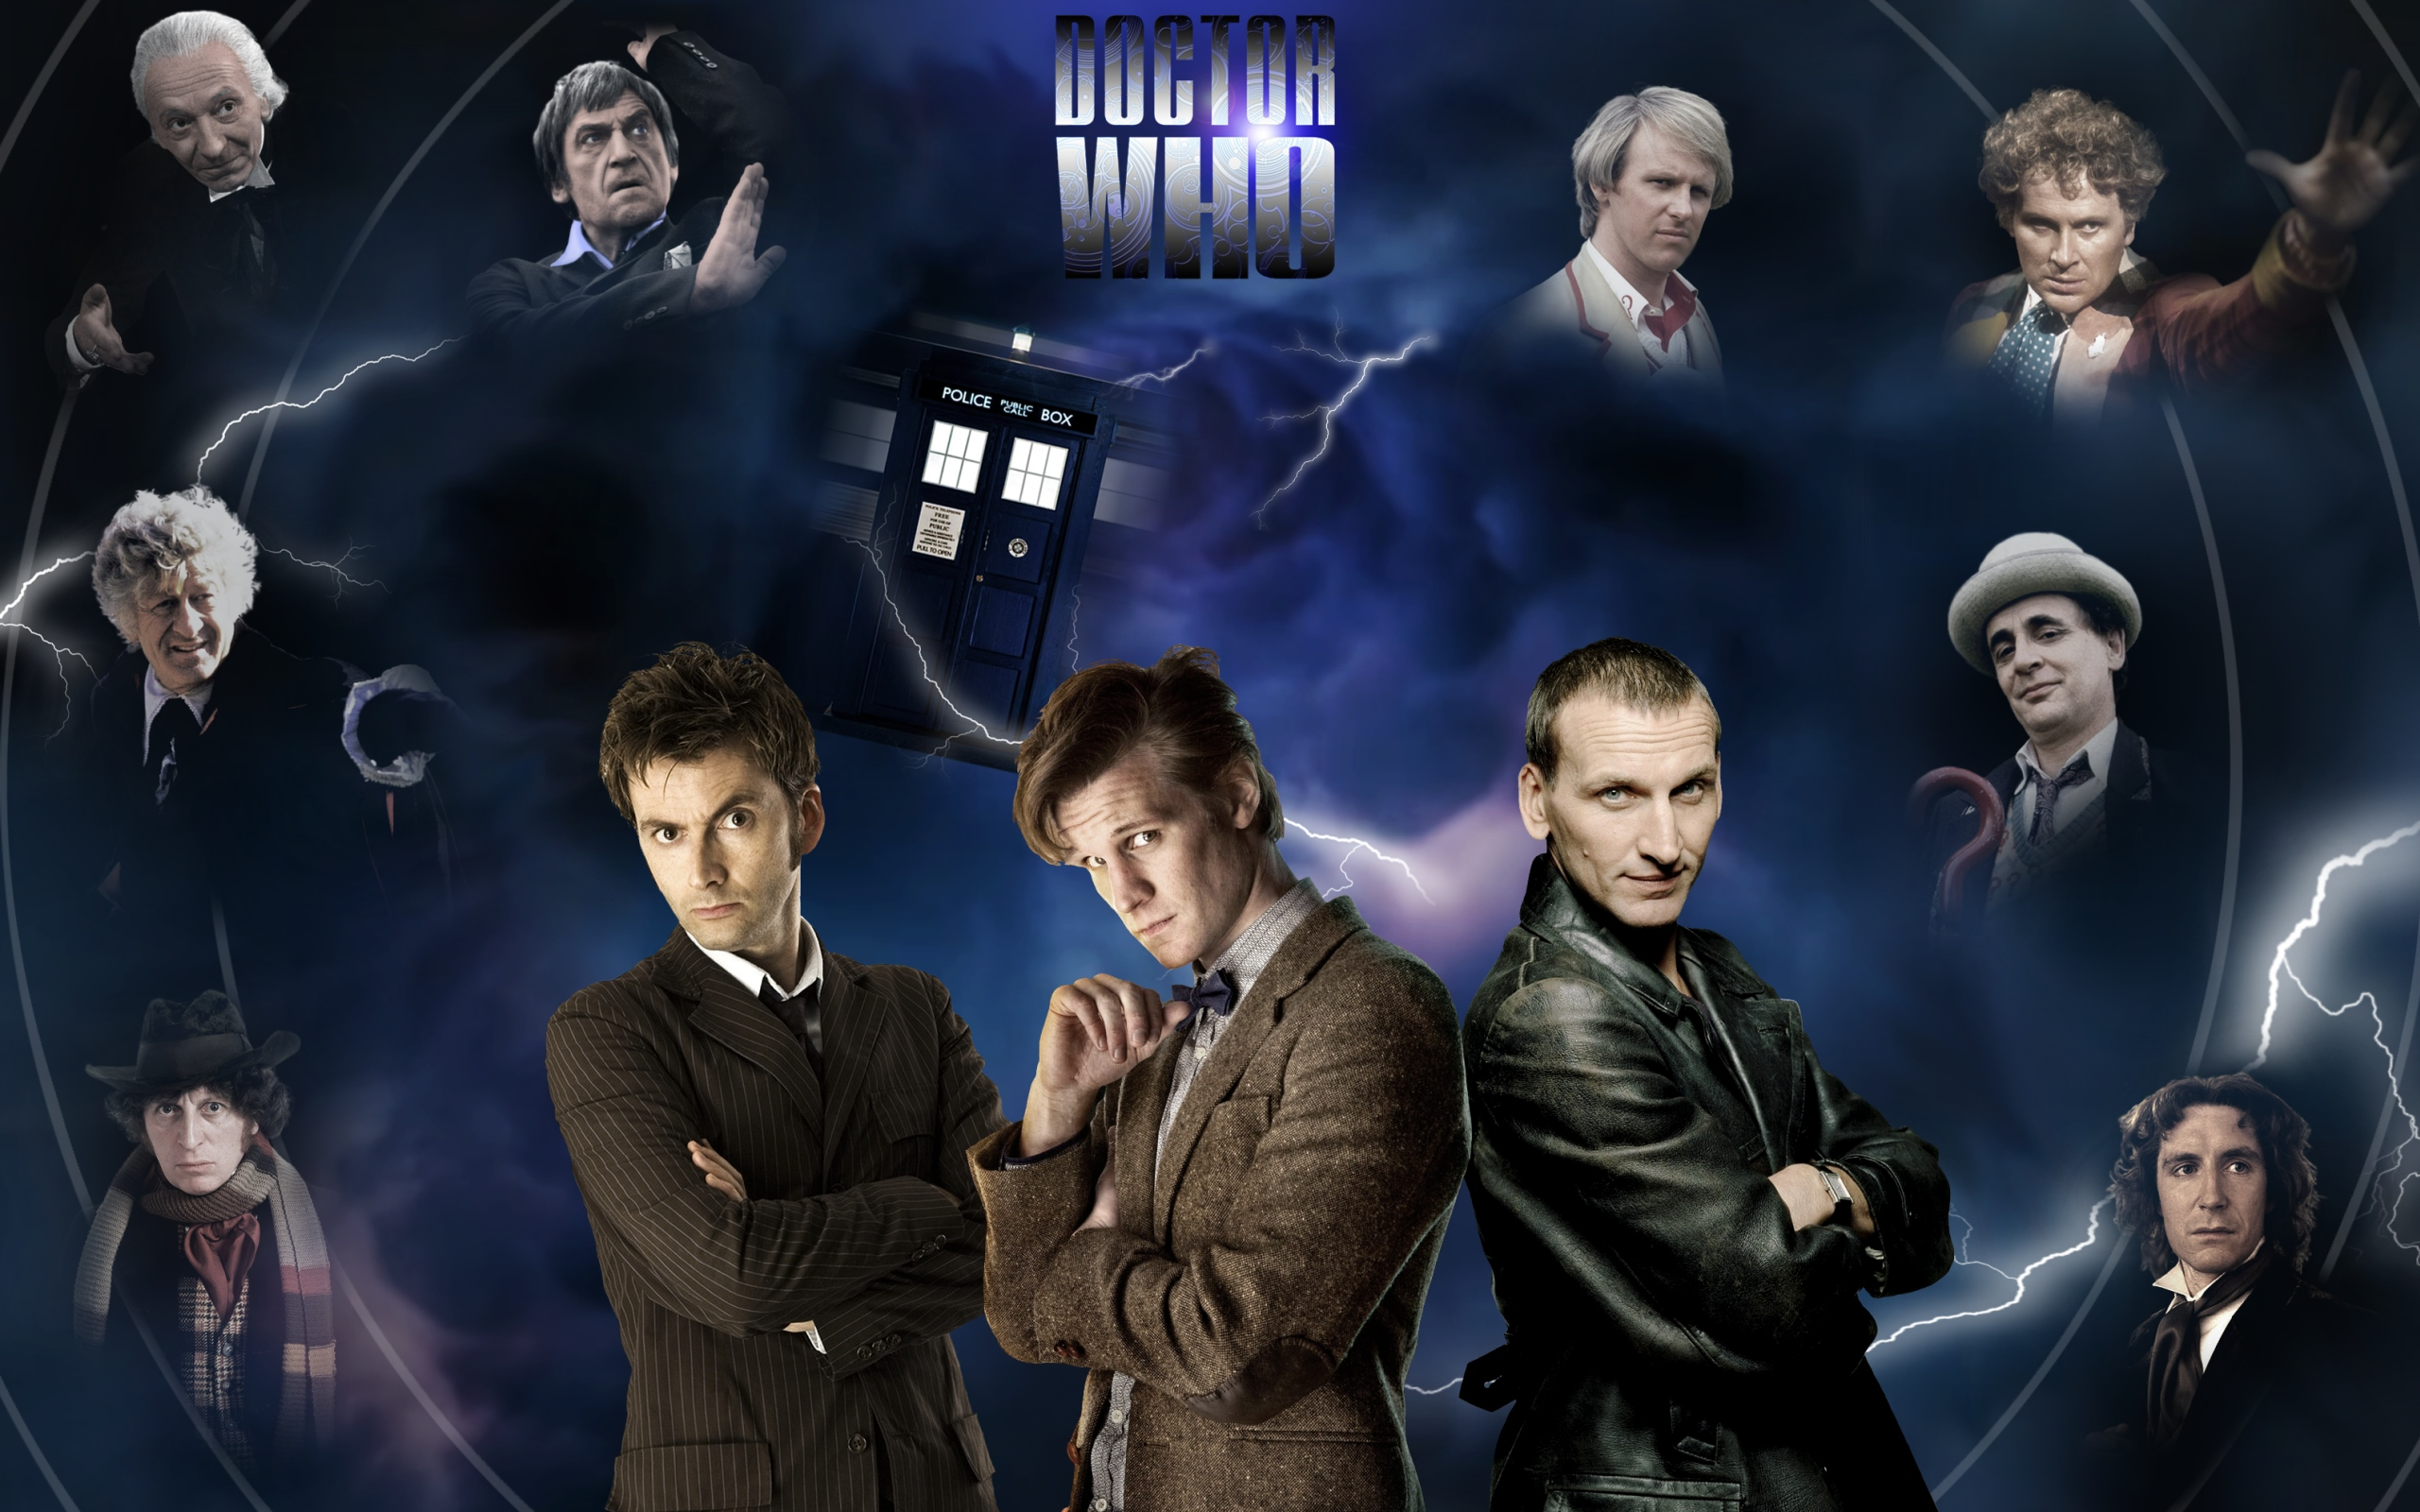 картинки доктора кто 10 сезон